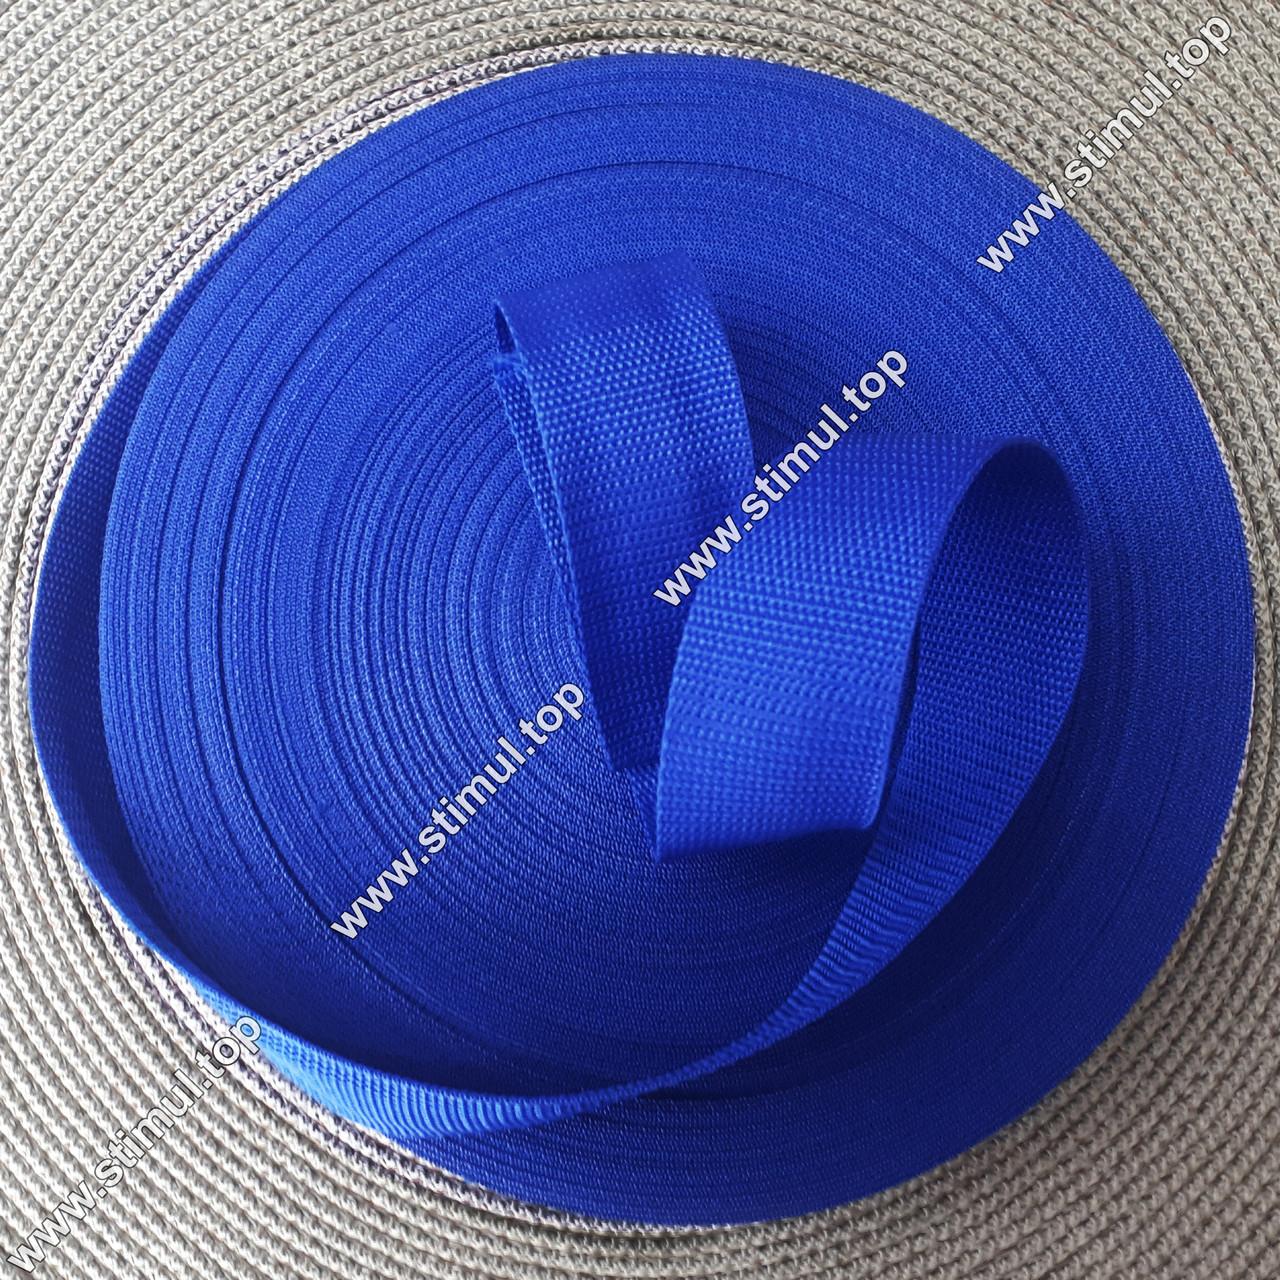 Тесьма цветная 30 мм (бухта 50 м) ЭЛЕКТРИК / Стропа сумочная ременная / Лента для рюкзаков / Стрічка ремінна